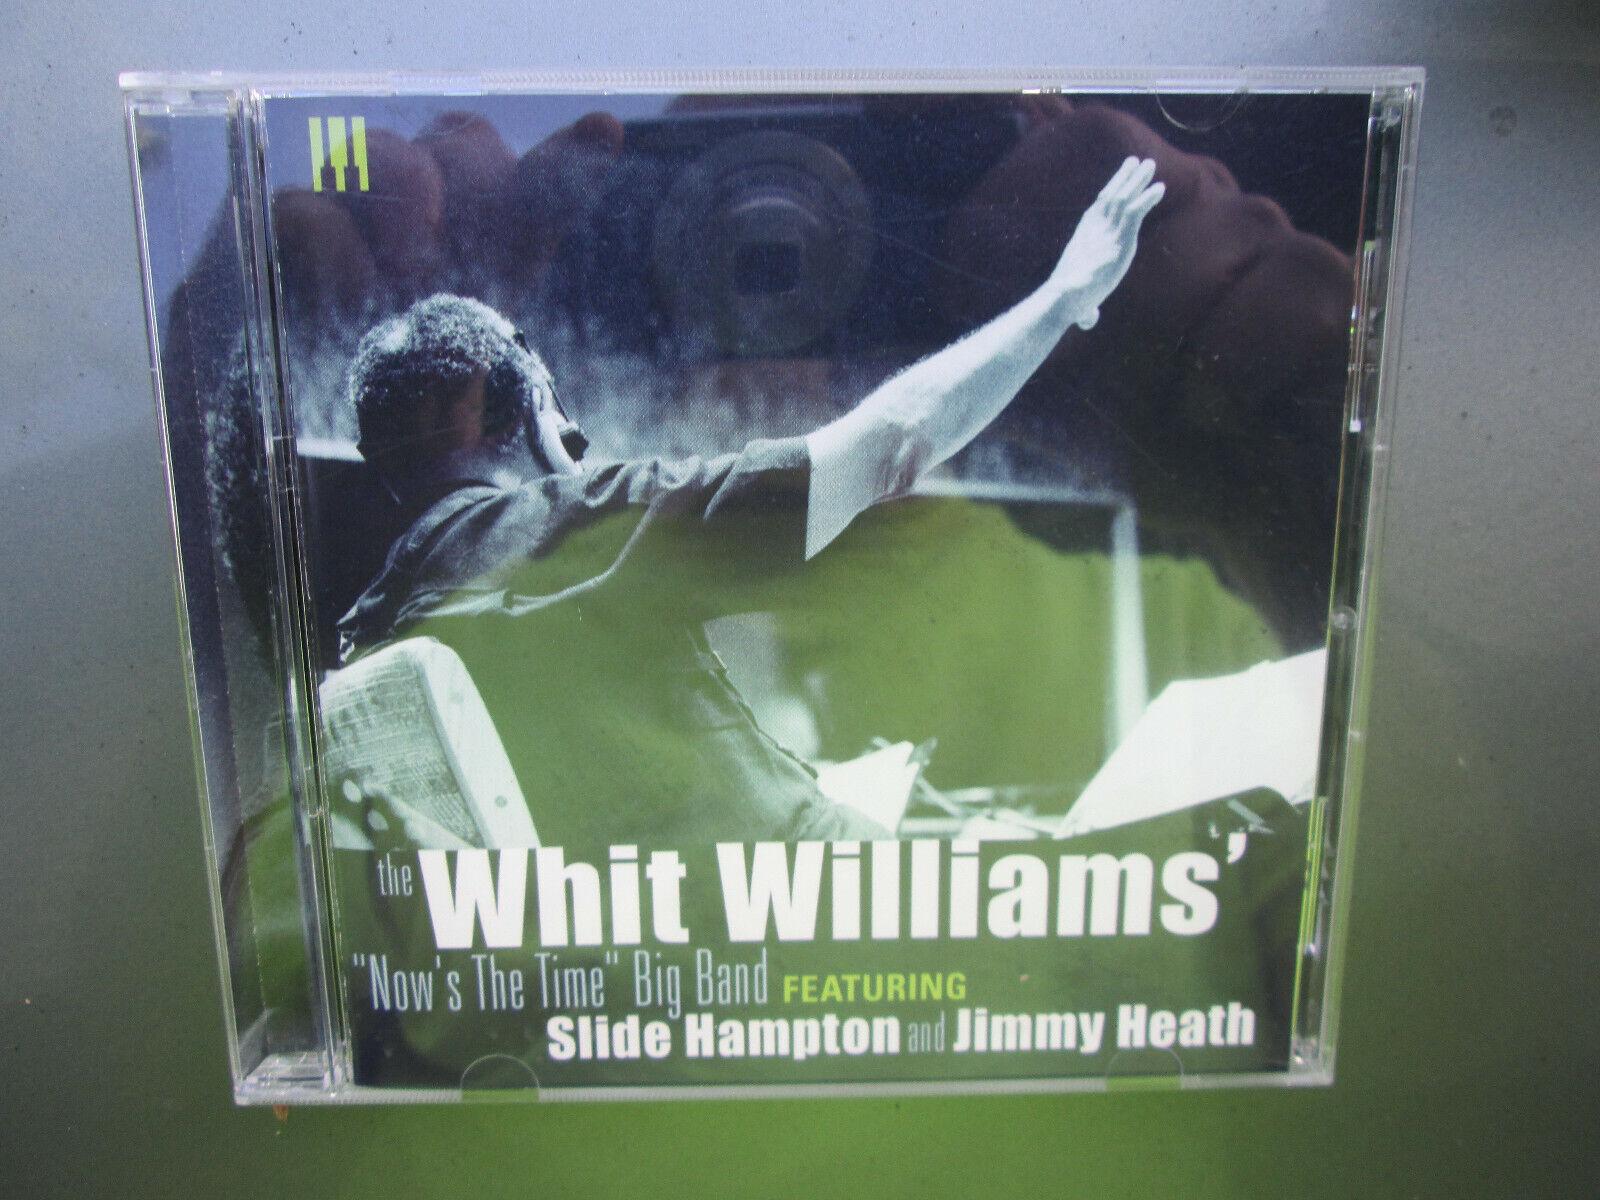 WHIT WILLIAMS - Jazz Sax - RARE CD Album NICE USED COPY RARE CD Album - $19.99